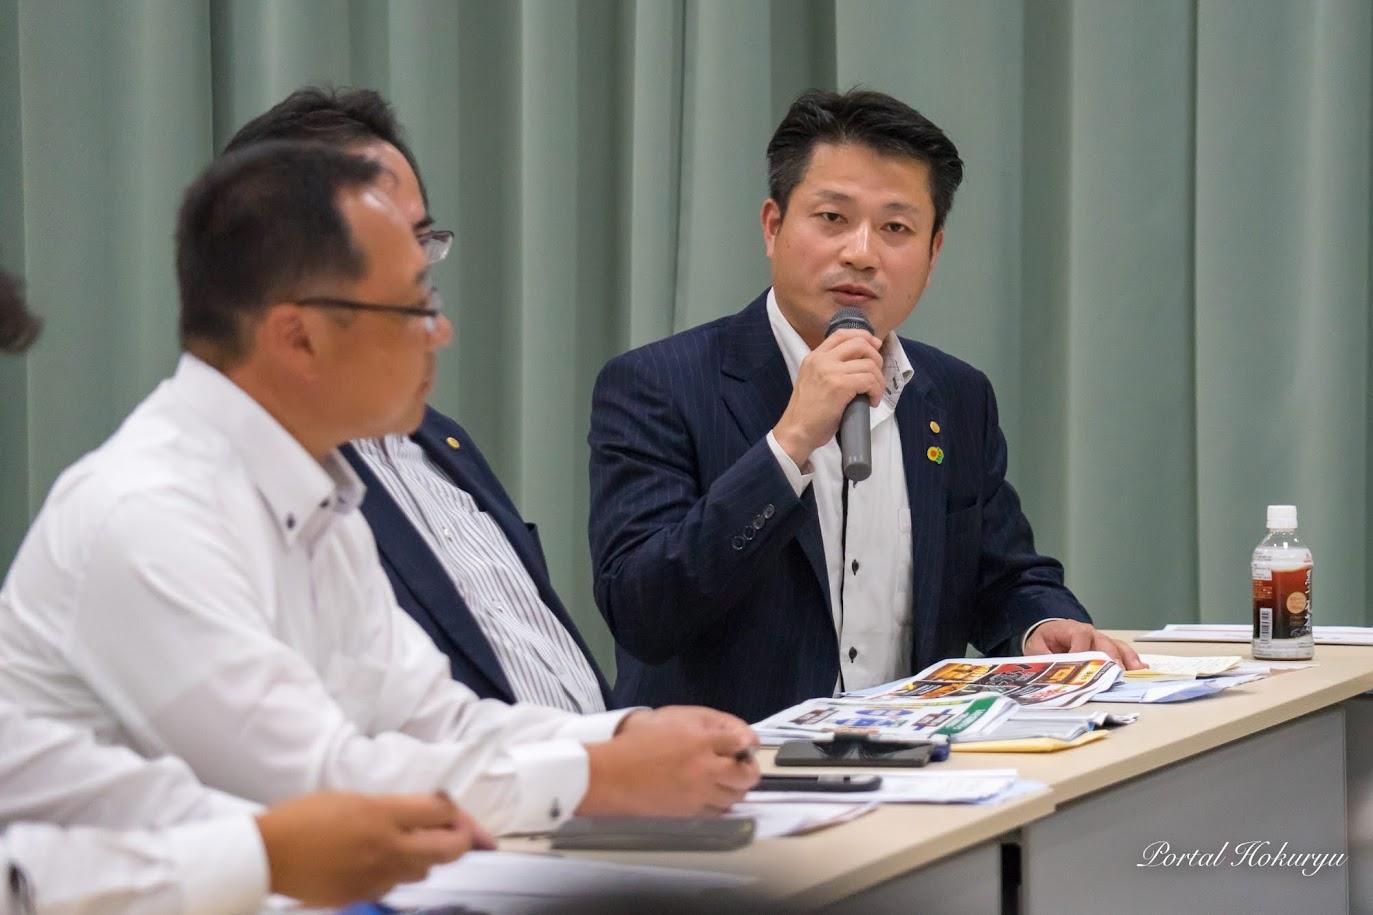 (株)マルシェ・加藤洋嗣 代表取締役社長